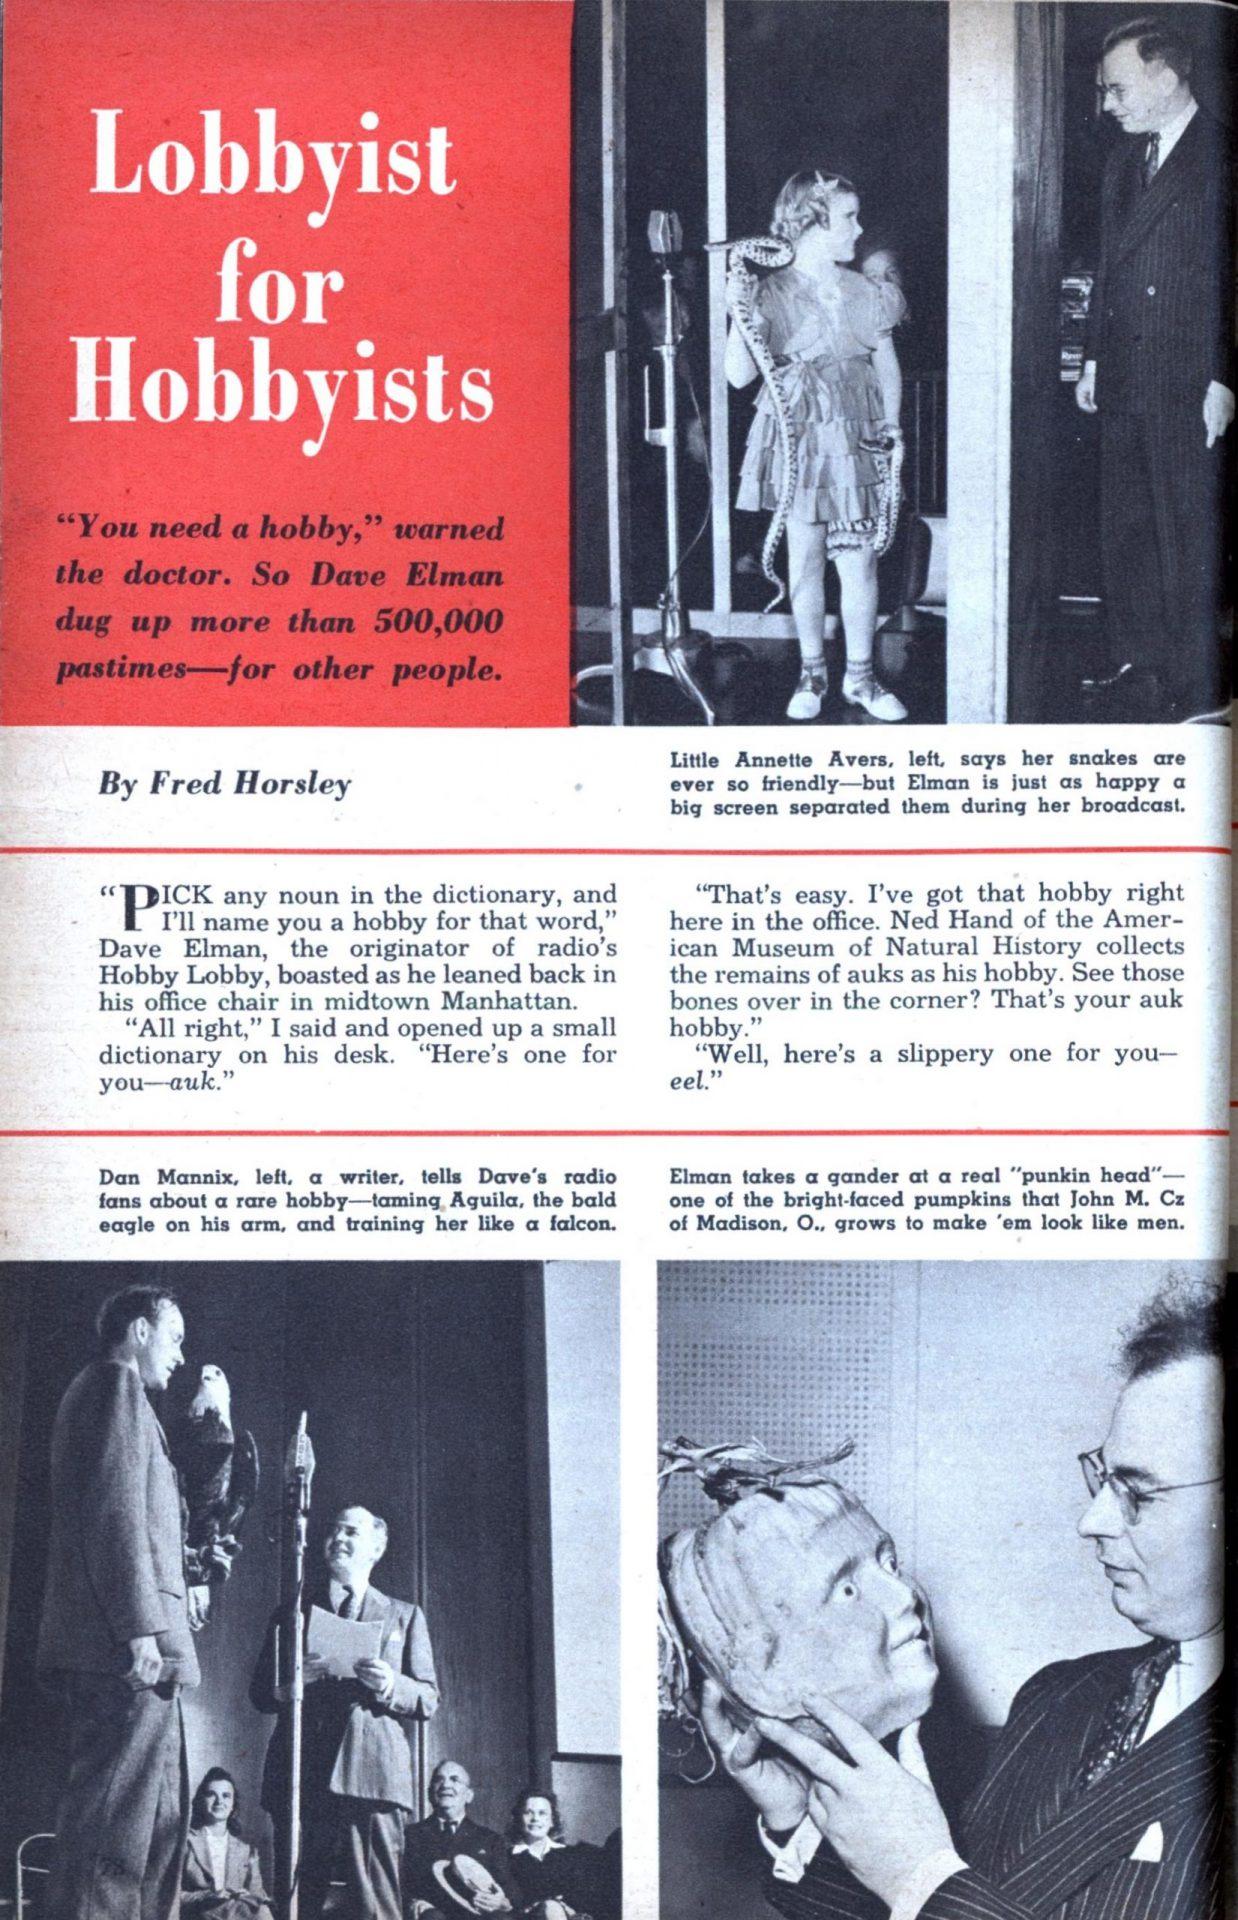 Revista Mechanix Illustrated de outubro de 1949 com a matéria sobre Dave Elman intitulada Lobbyist for Hobbyists.